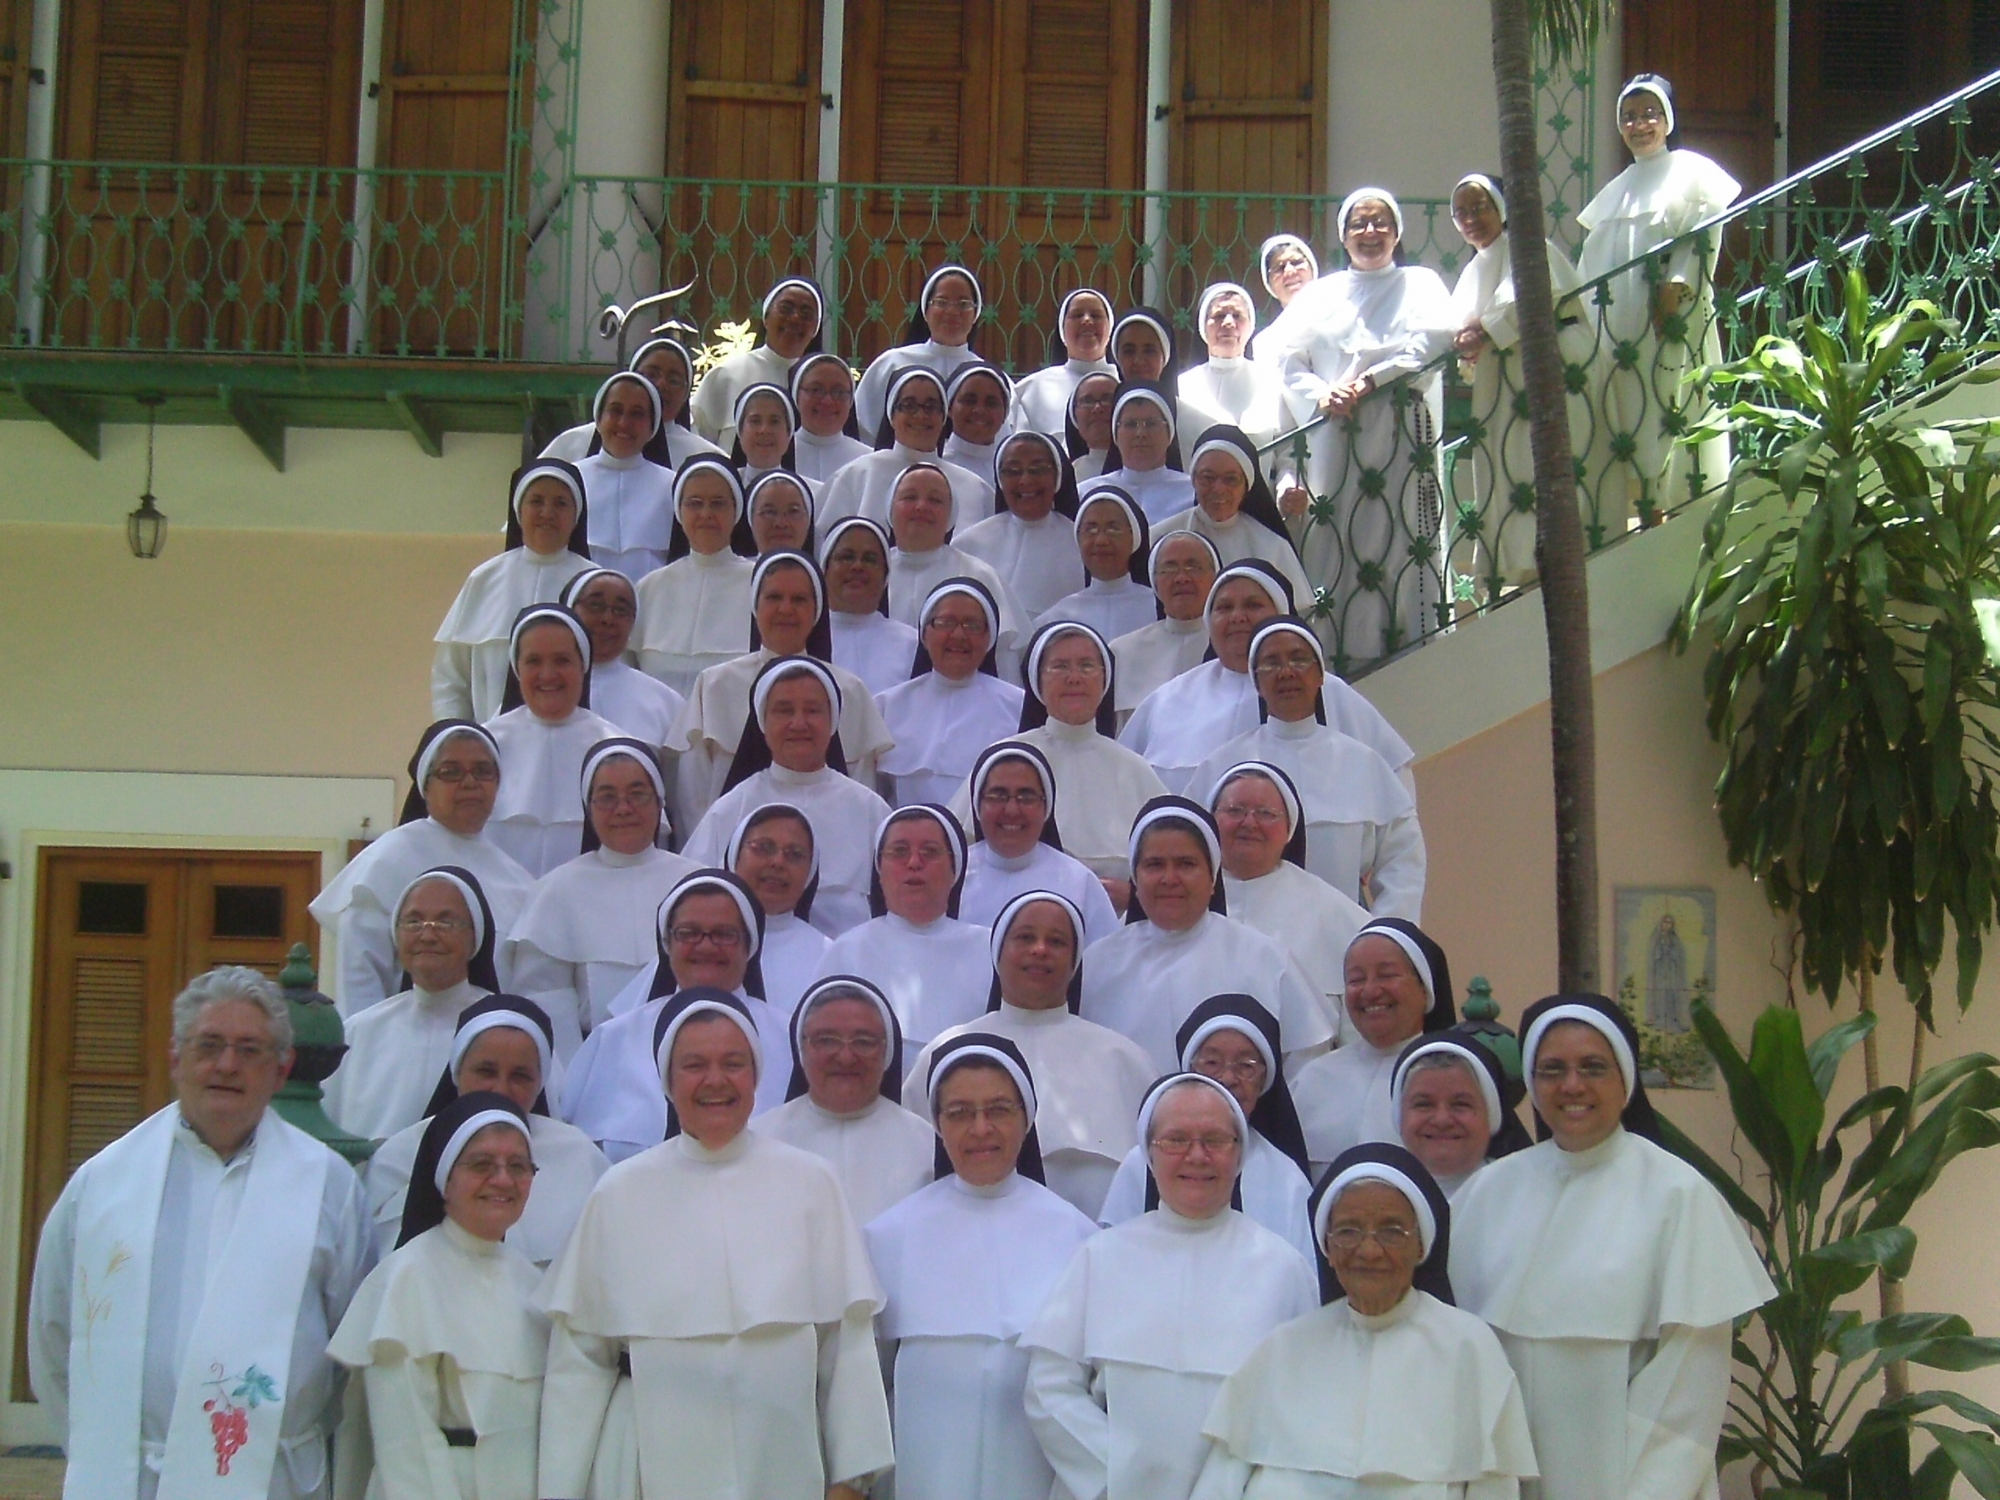 Hermanas Dominicas de Fatima